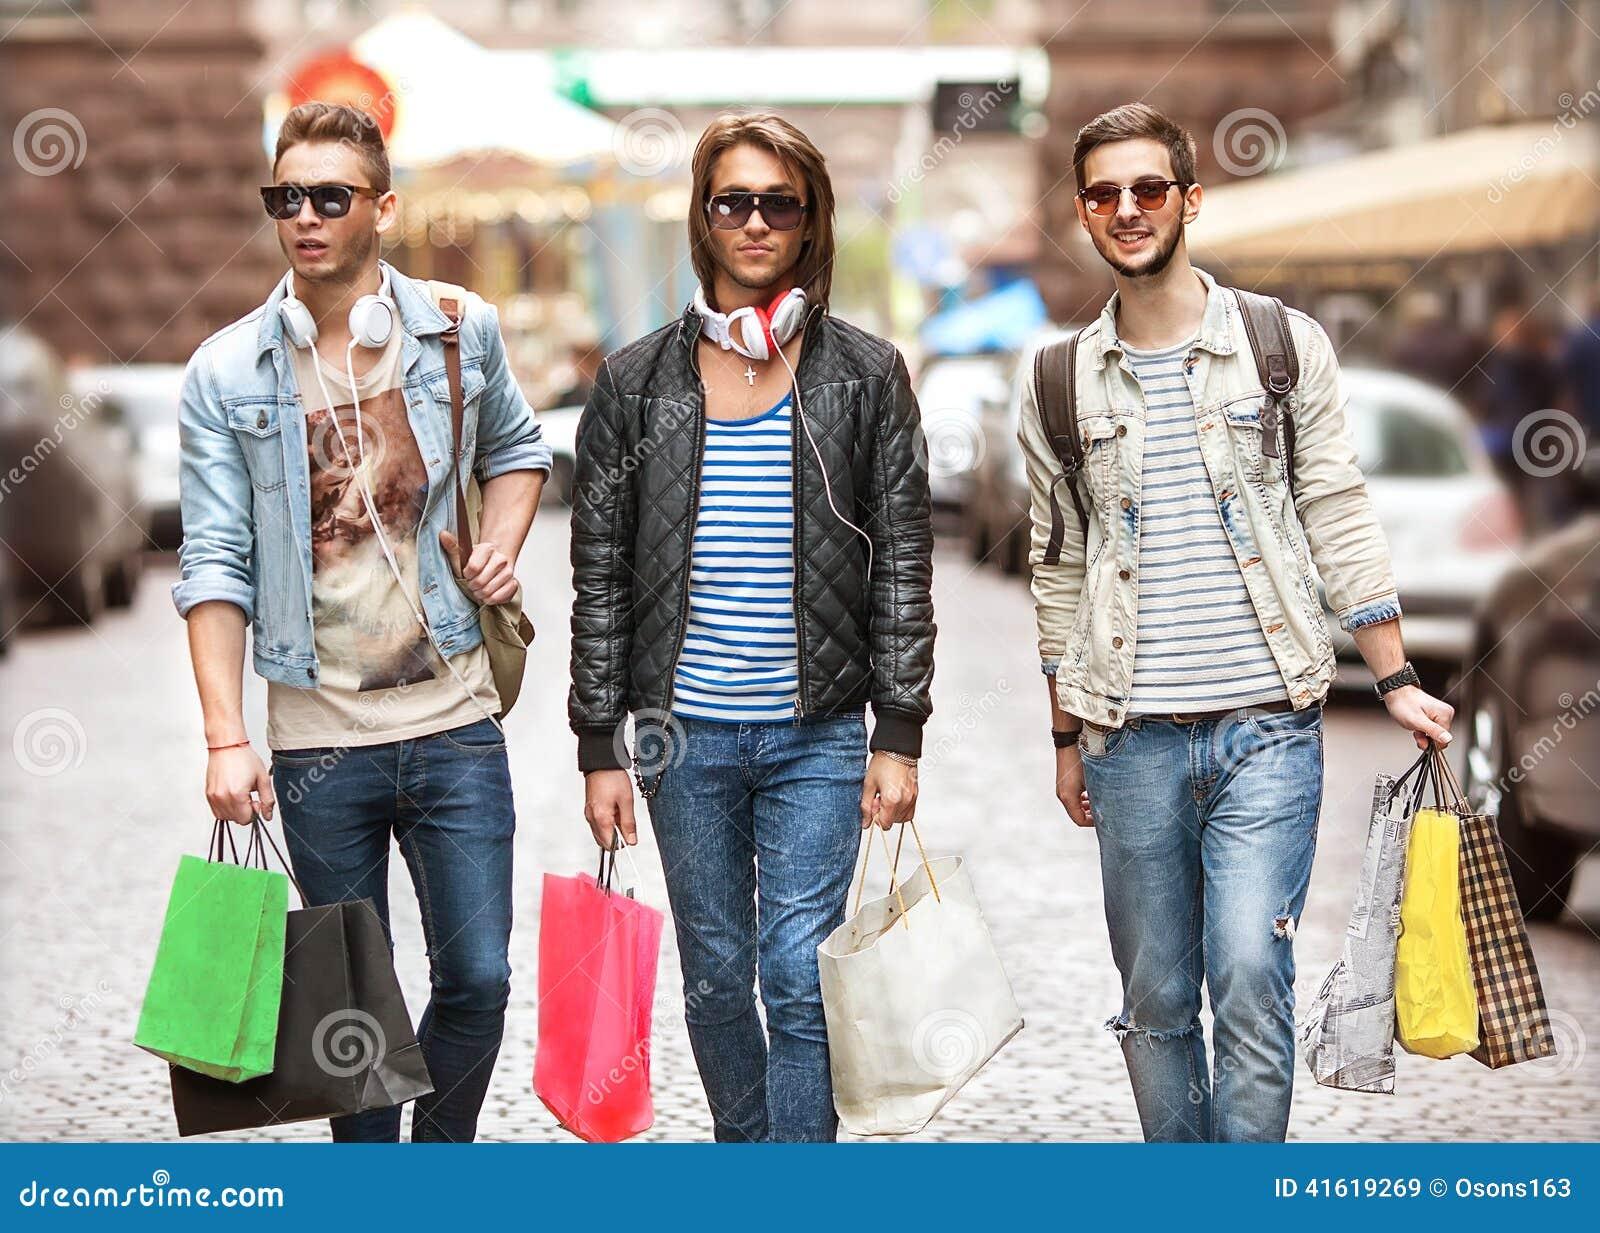 Fashion Young Guys Go Shopping Stock Photo - Image 41619269